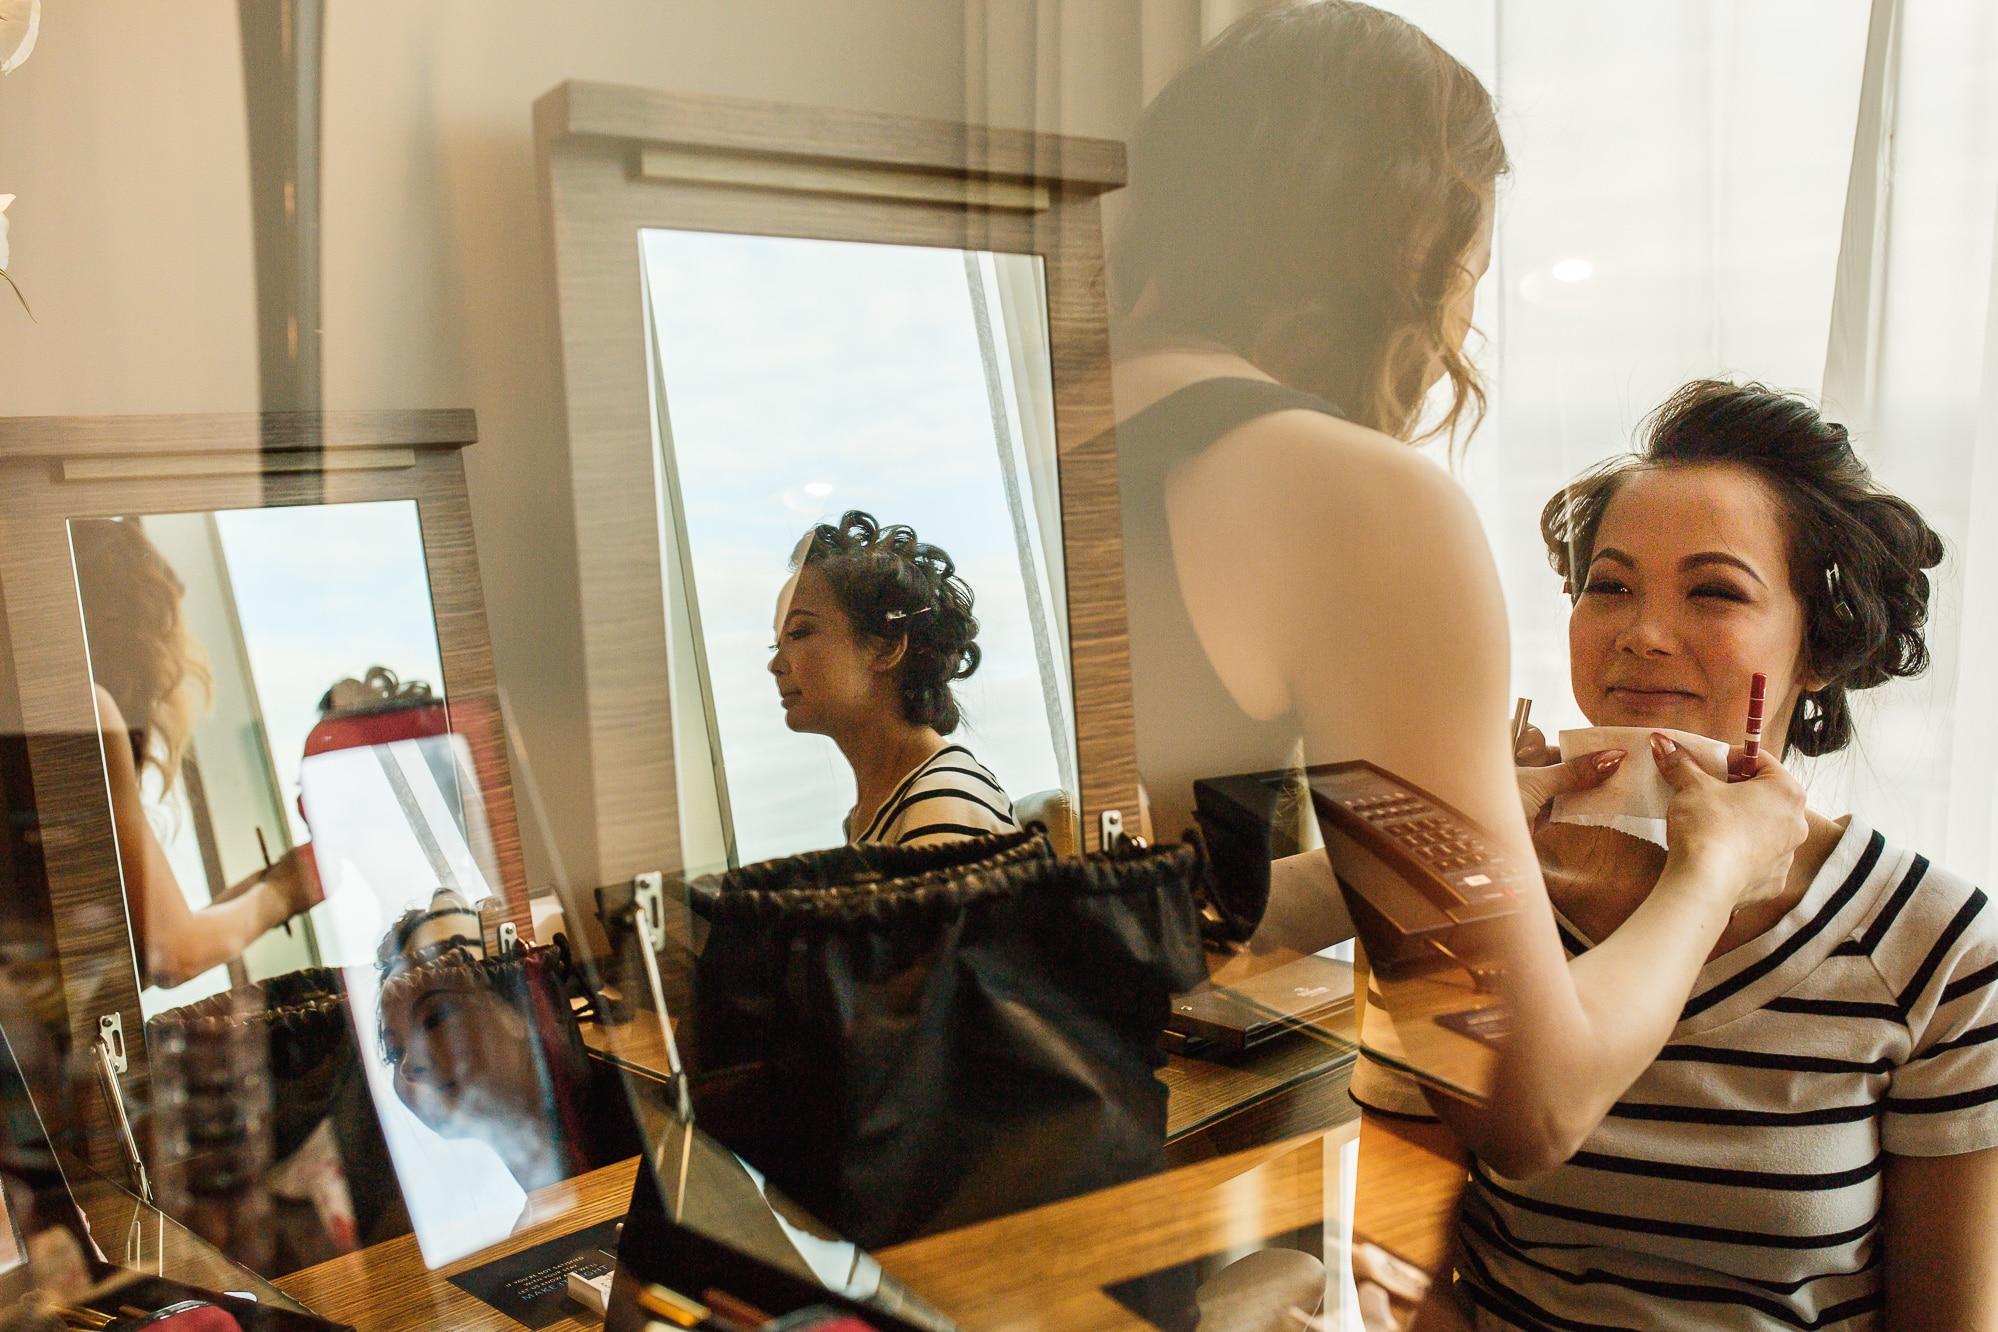 Reflections of bridal preparation